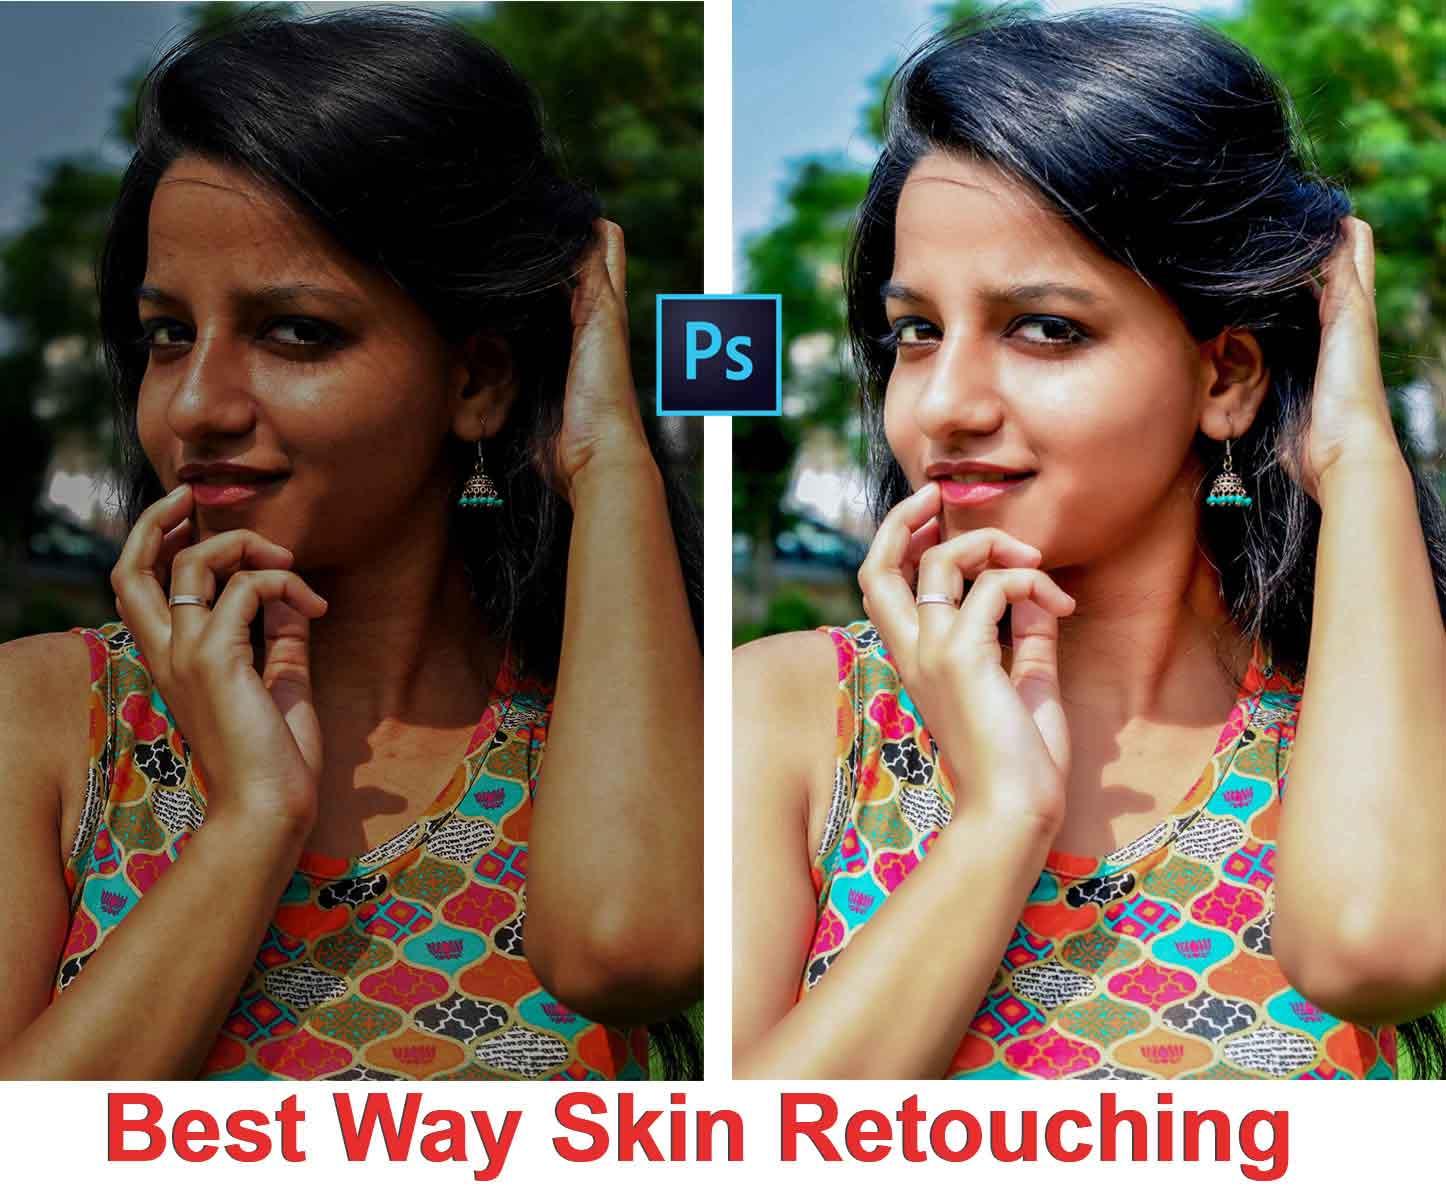 Skin retouching best way skin retouching technique in photoshop skin retouching best way skin retouching technique in photoshop tutorial baditri Image collections